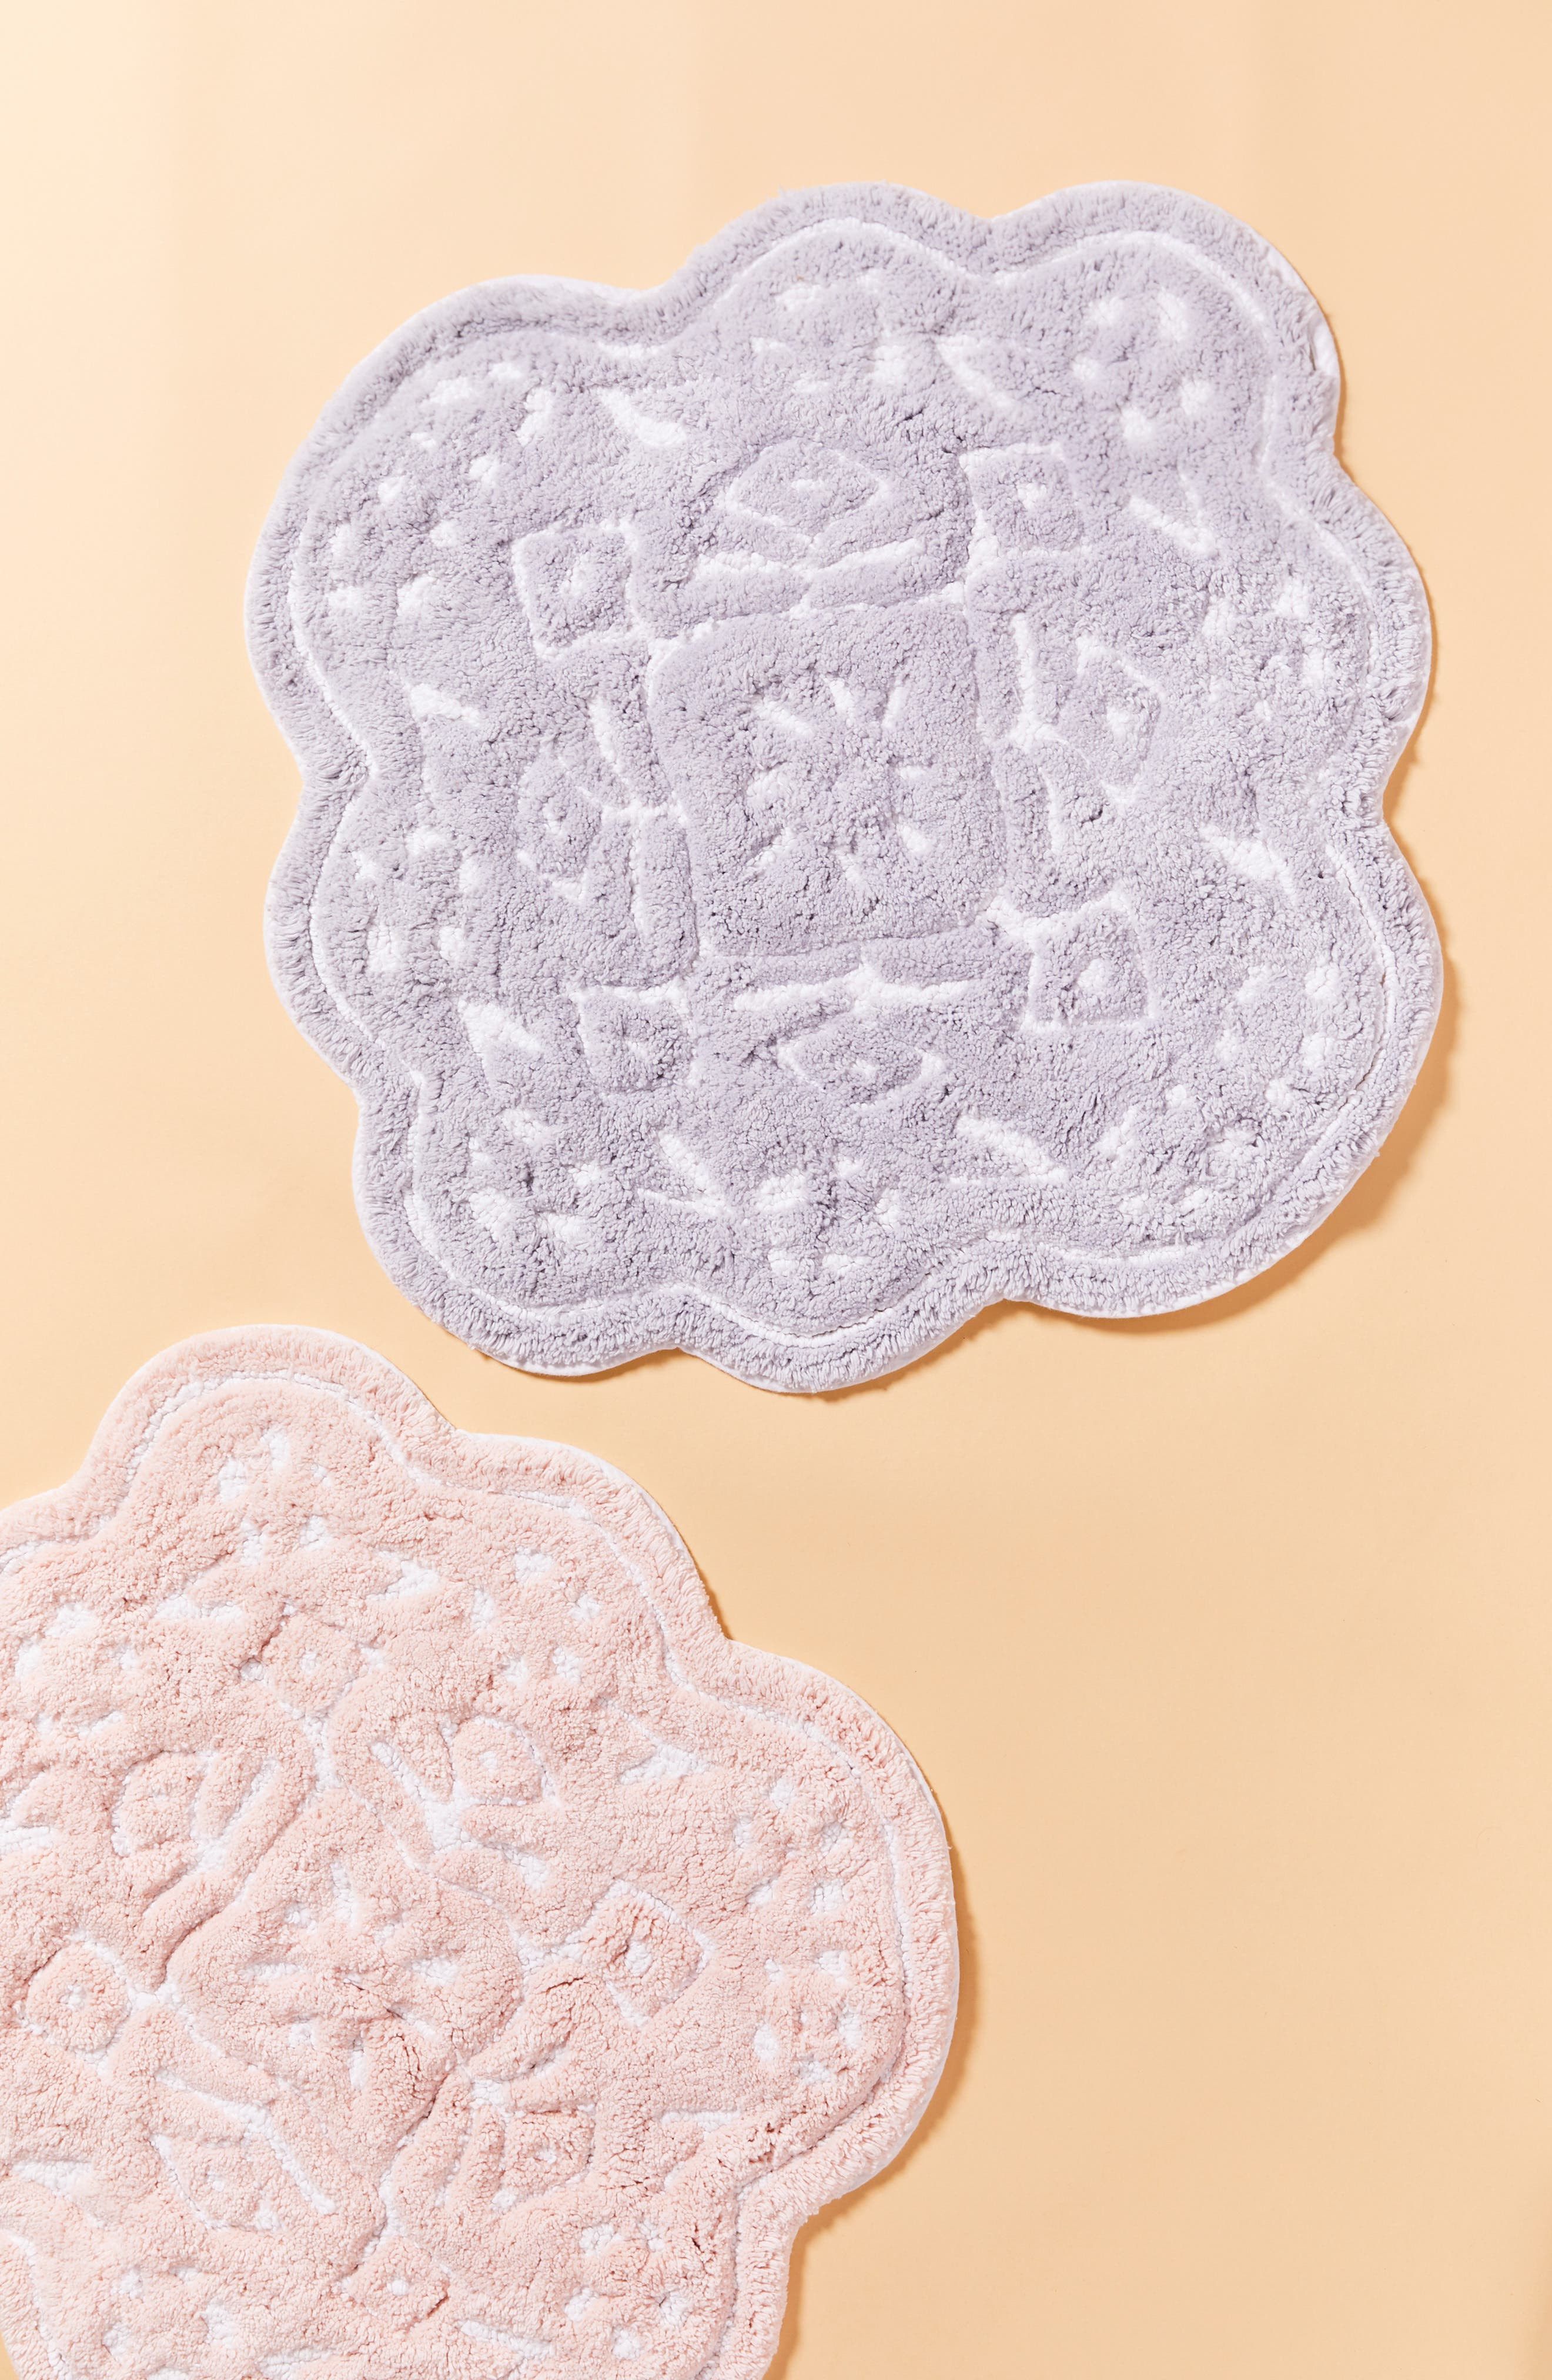 ANTHROPOLOGIE, Mosaic Tile Bath Mat, Main thumbnail 1, color, GREY